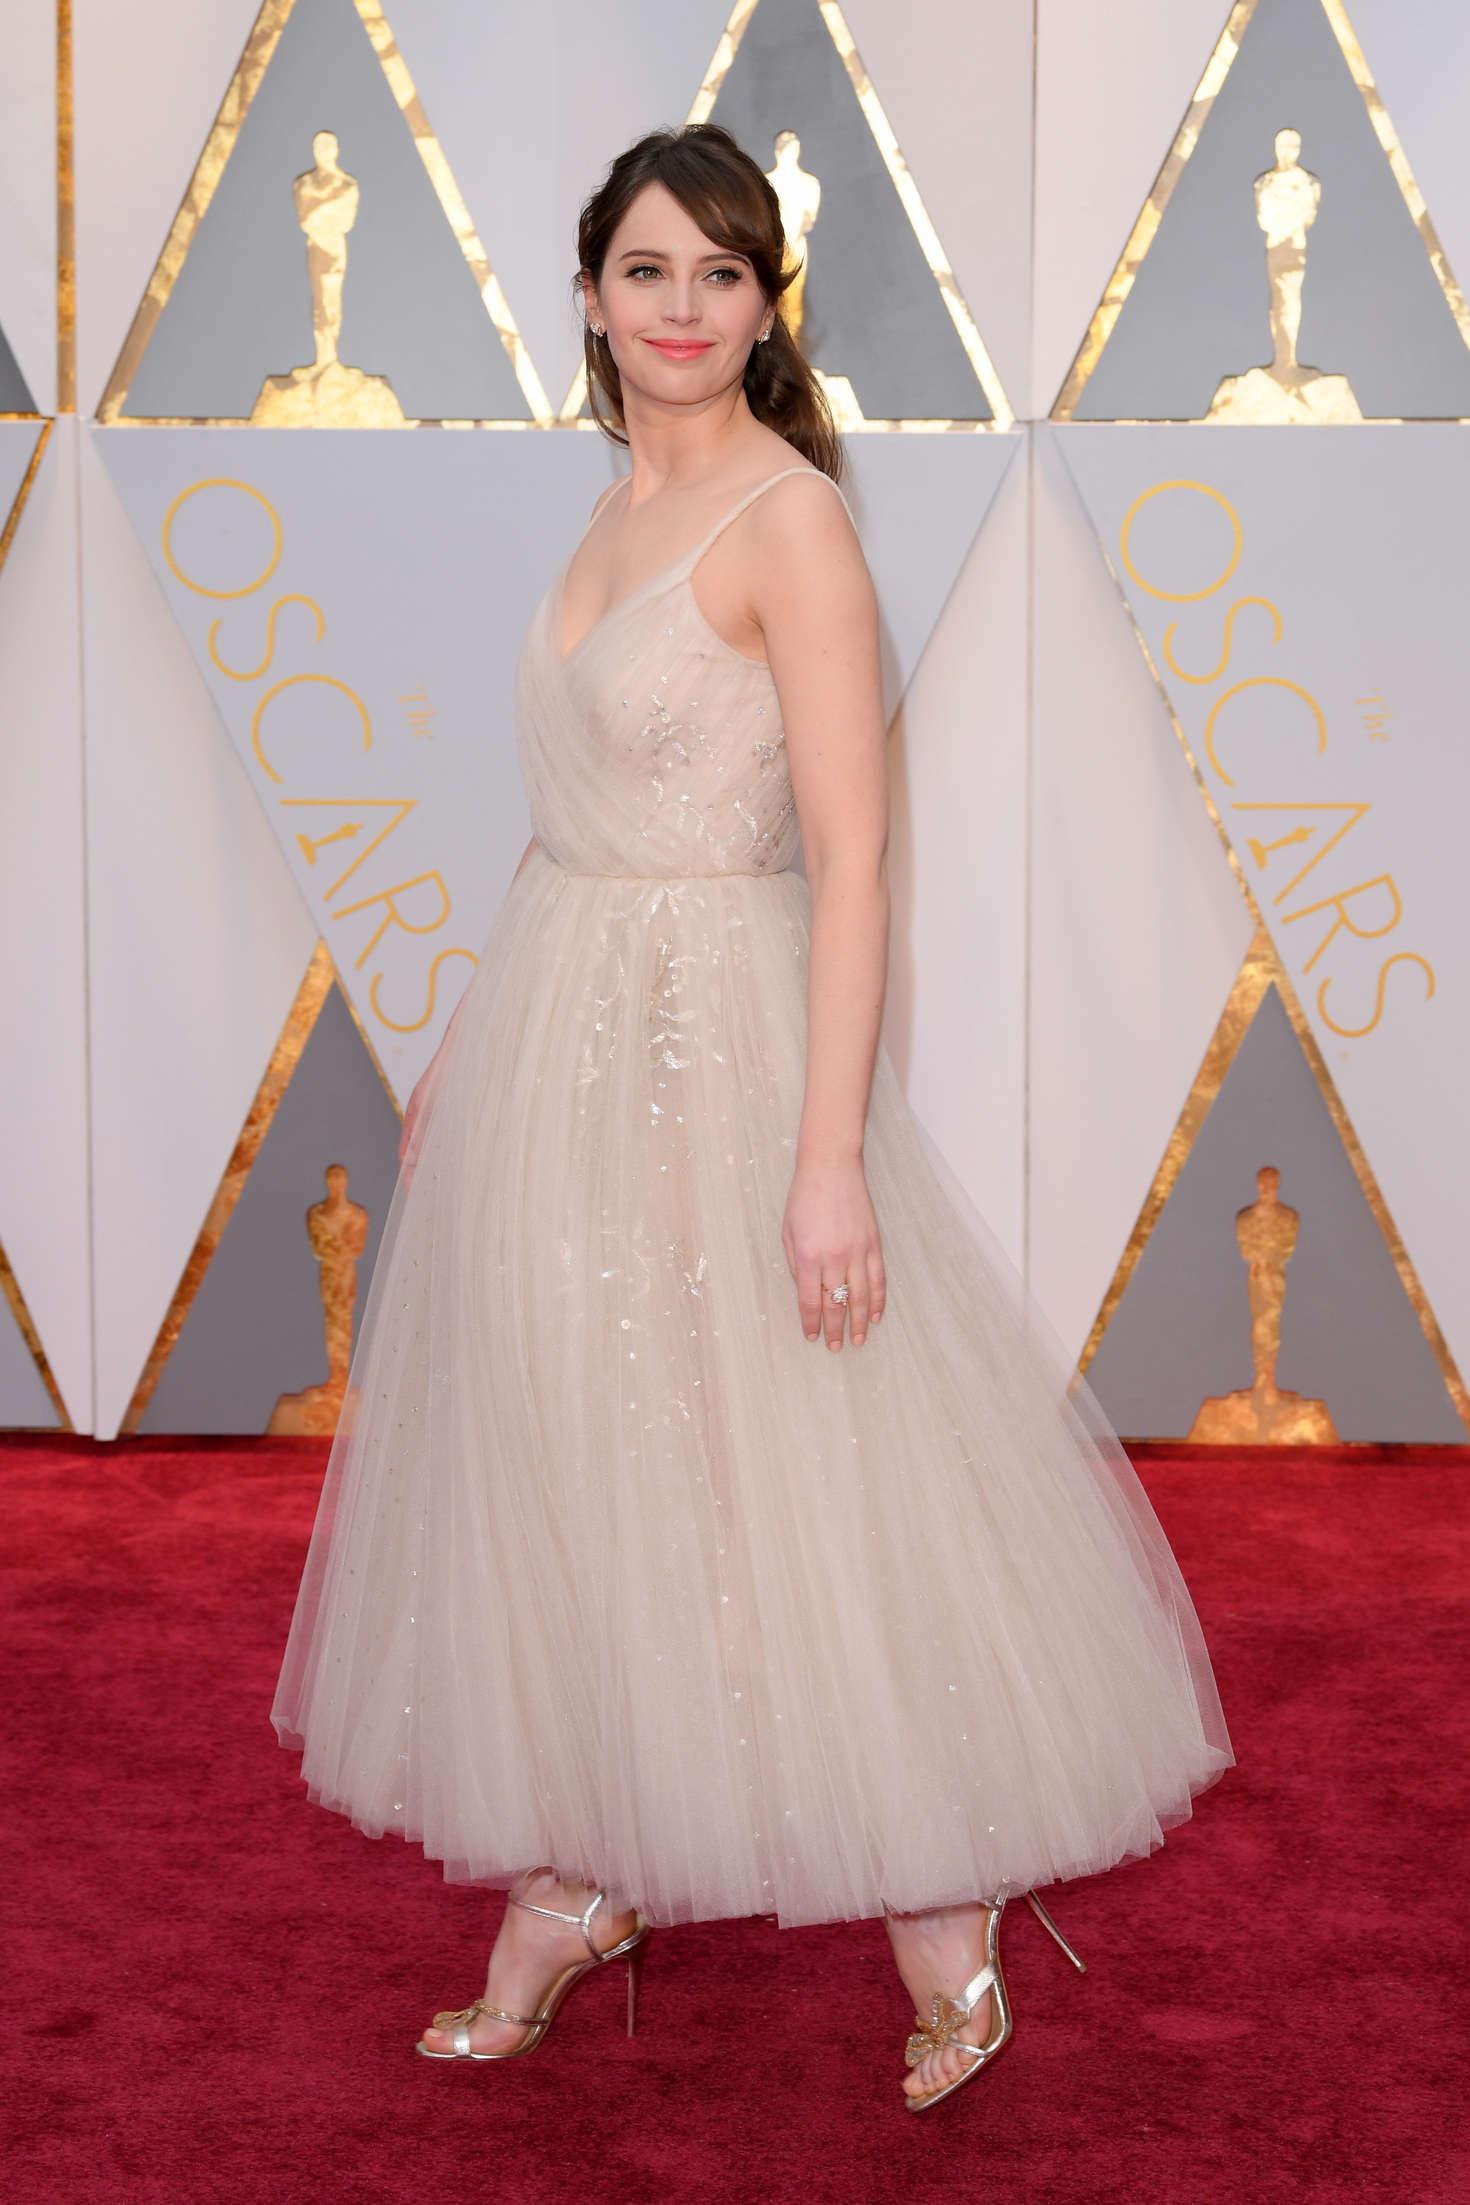 Felicity Jones - 2017 Academy Awards in Hollywood